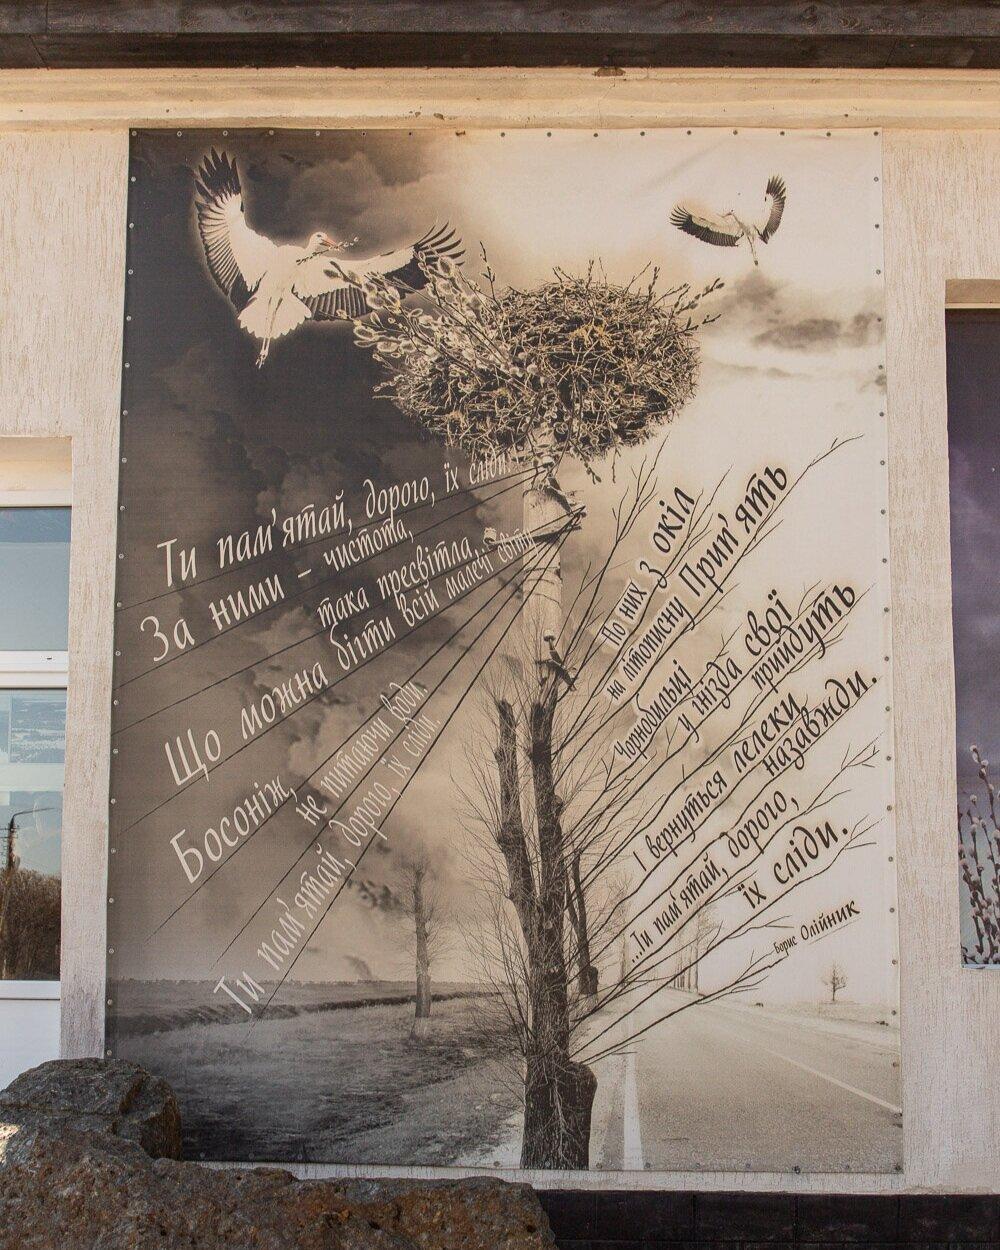 Dove art work in chernobyl